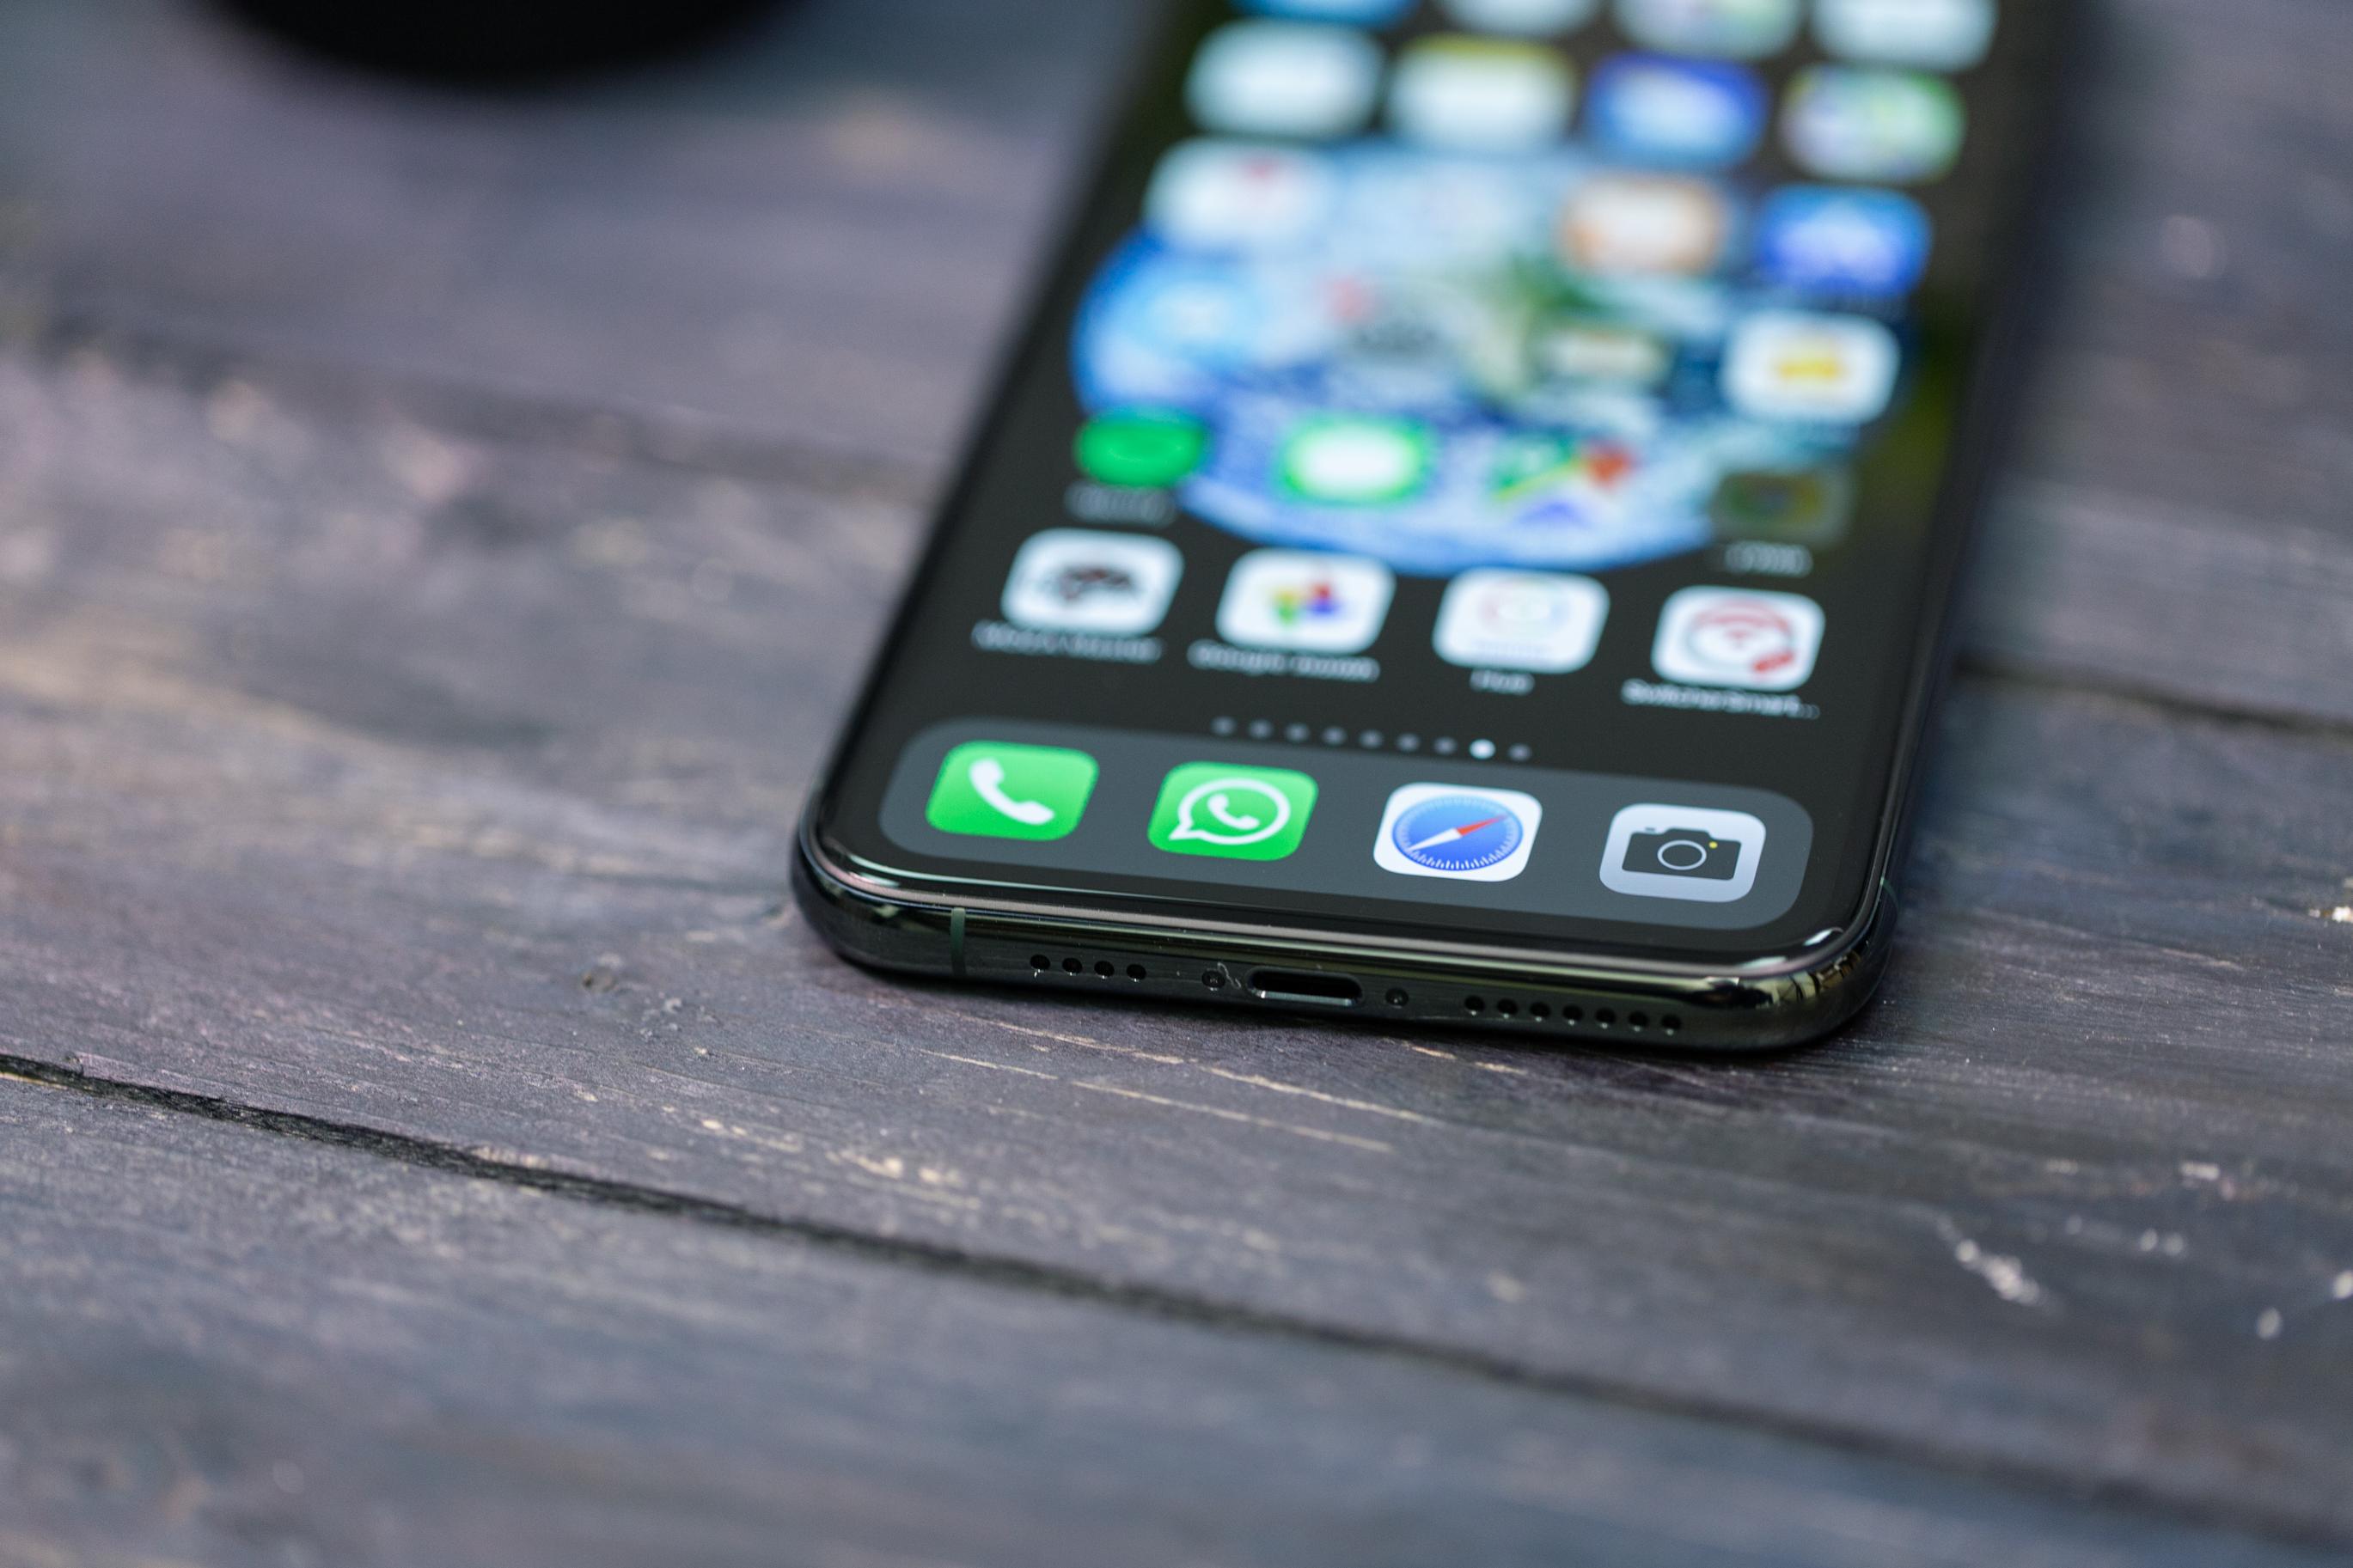 iPhone 11 או iPhone 11 Pro: מה כדאי לבחור?